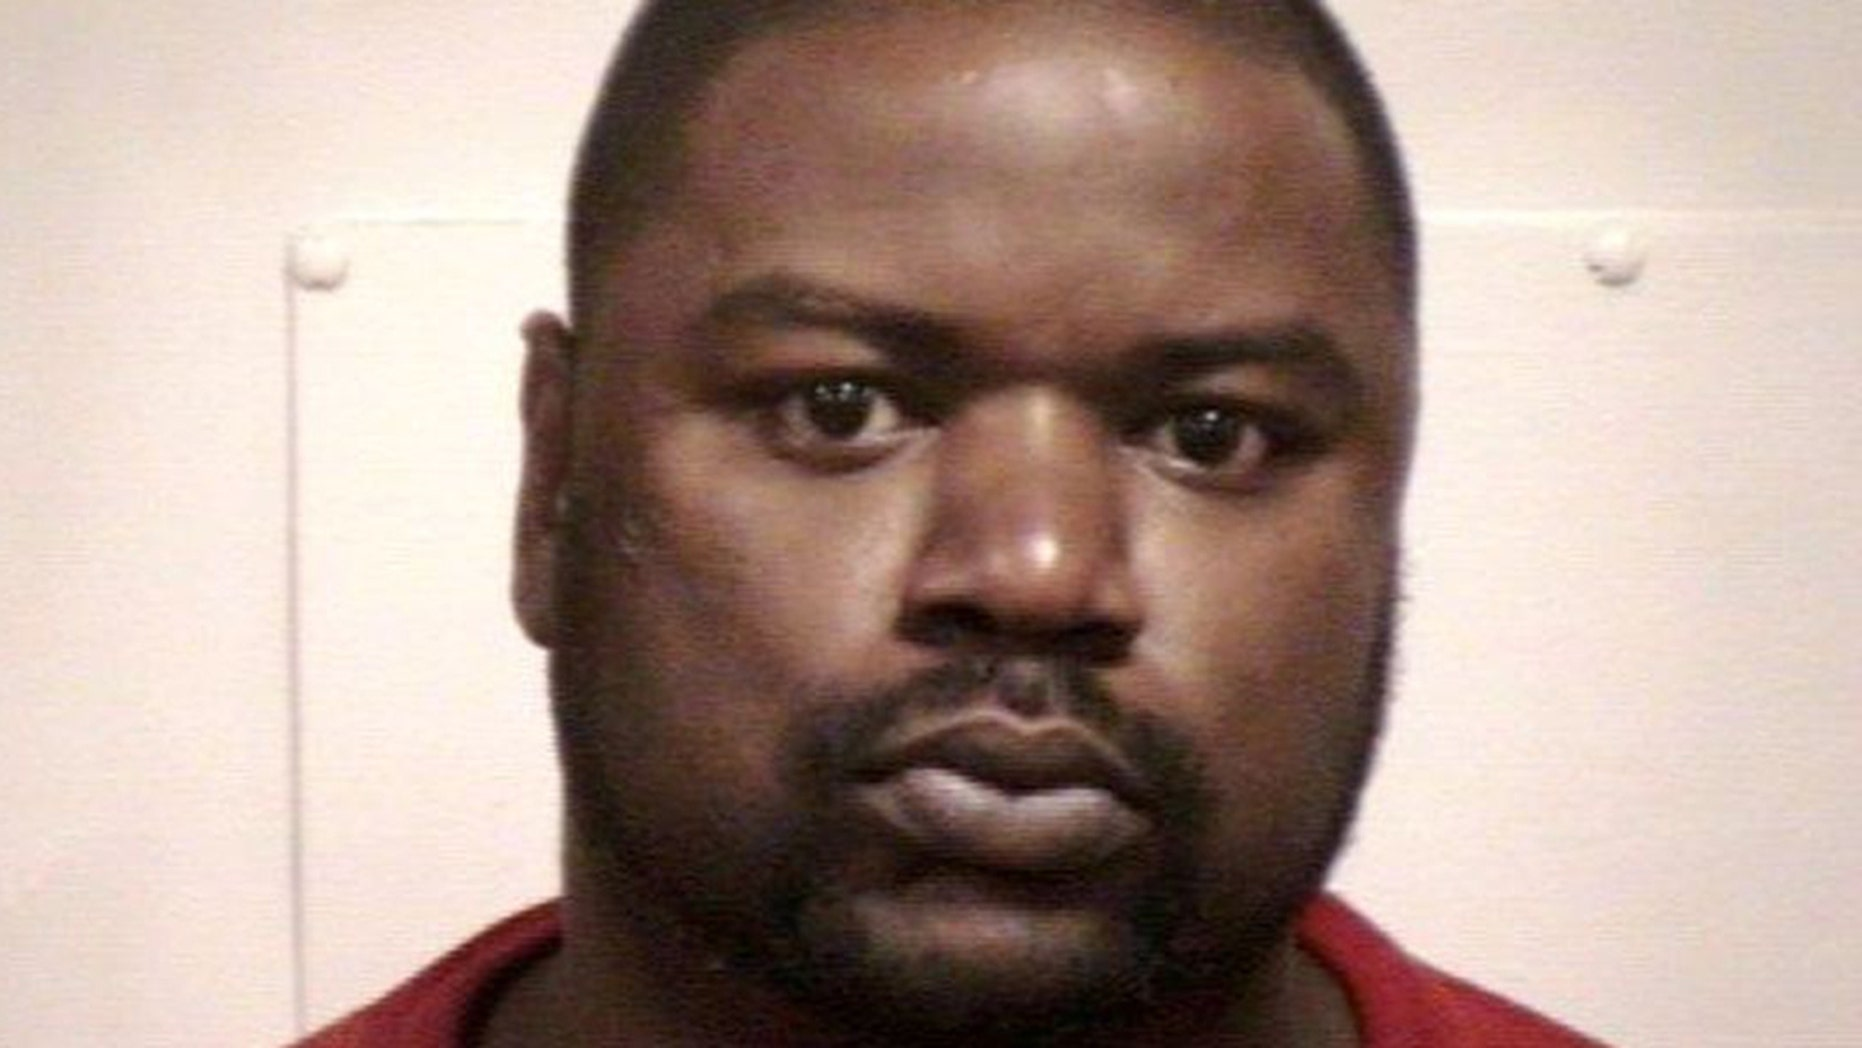 David Chislton was sentenced to 45 years in prison.